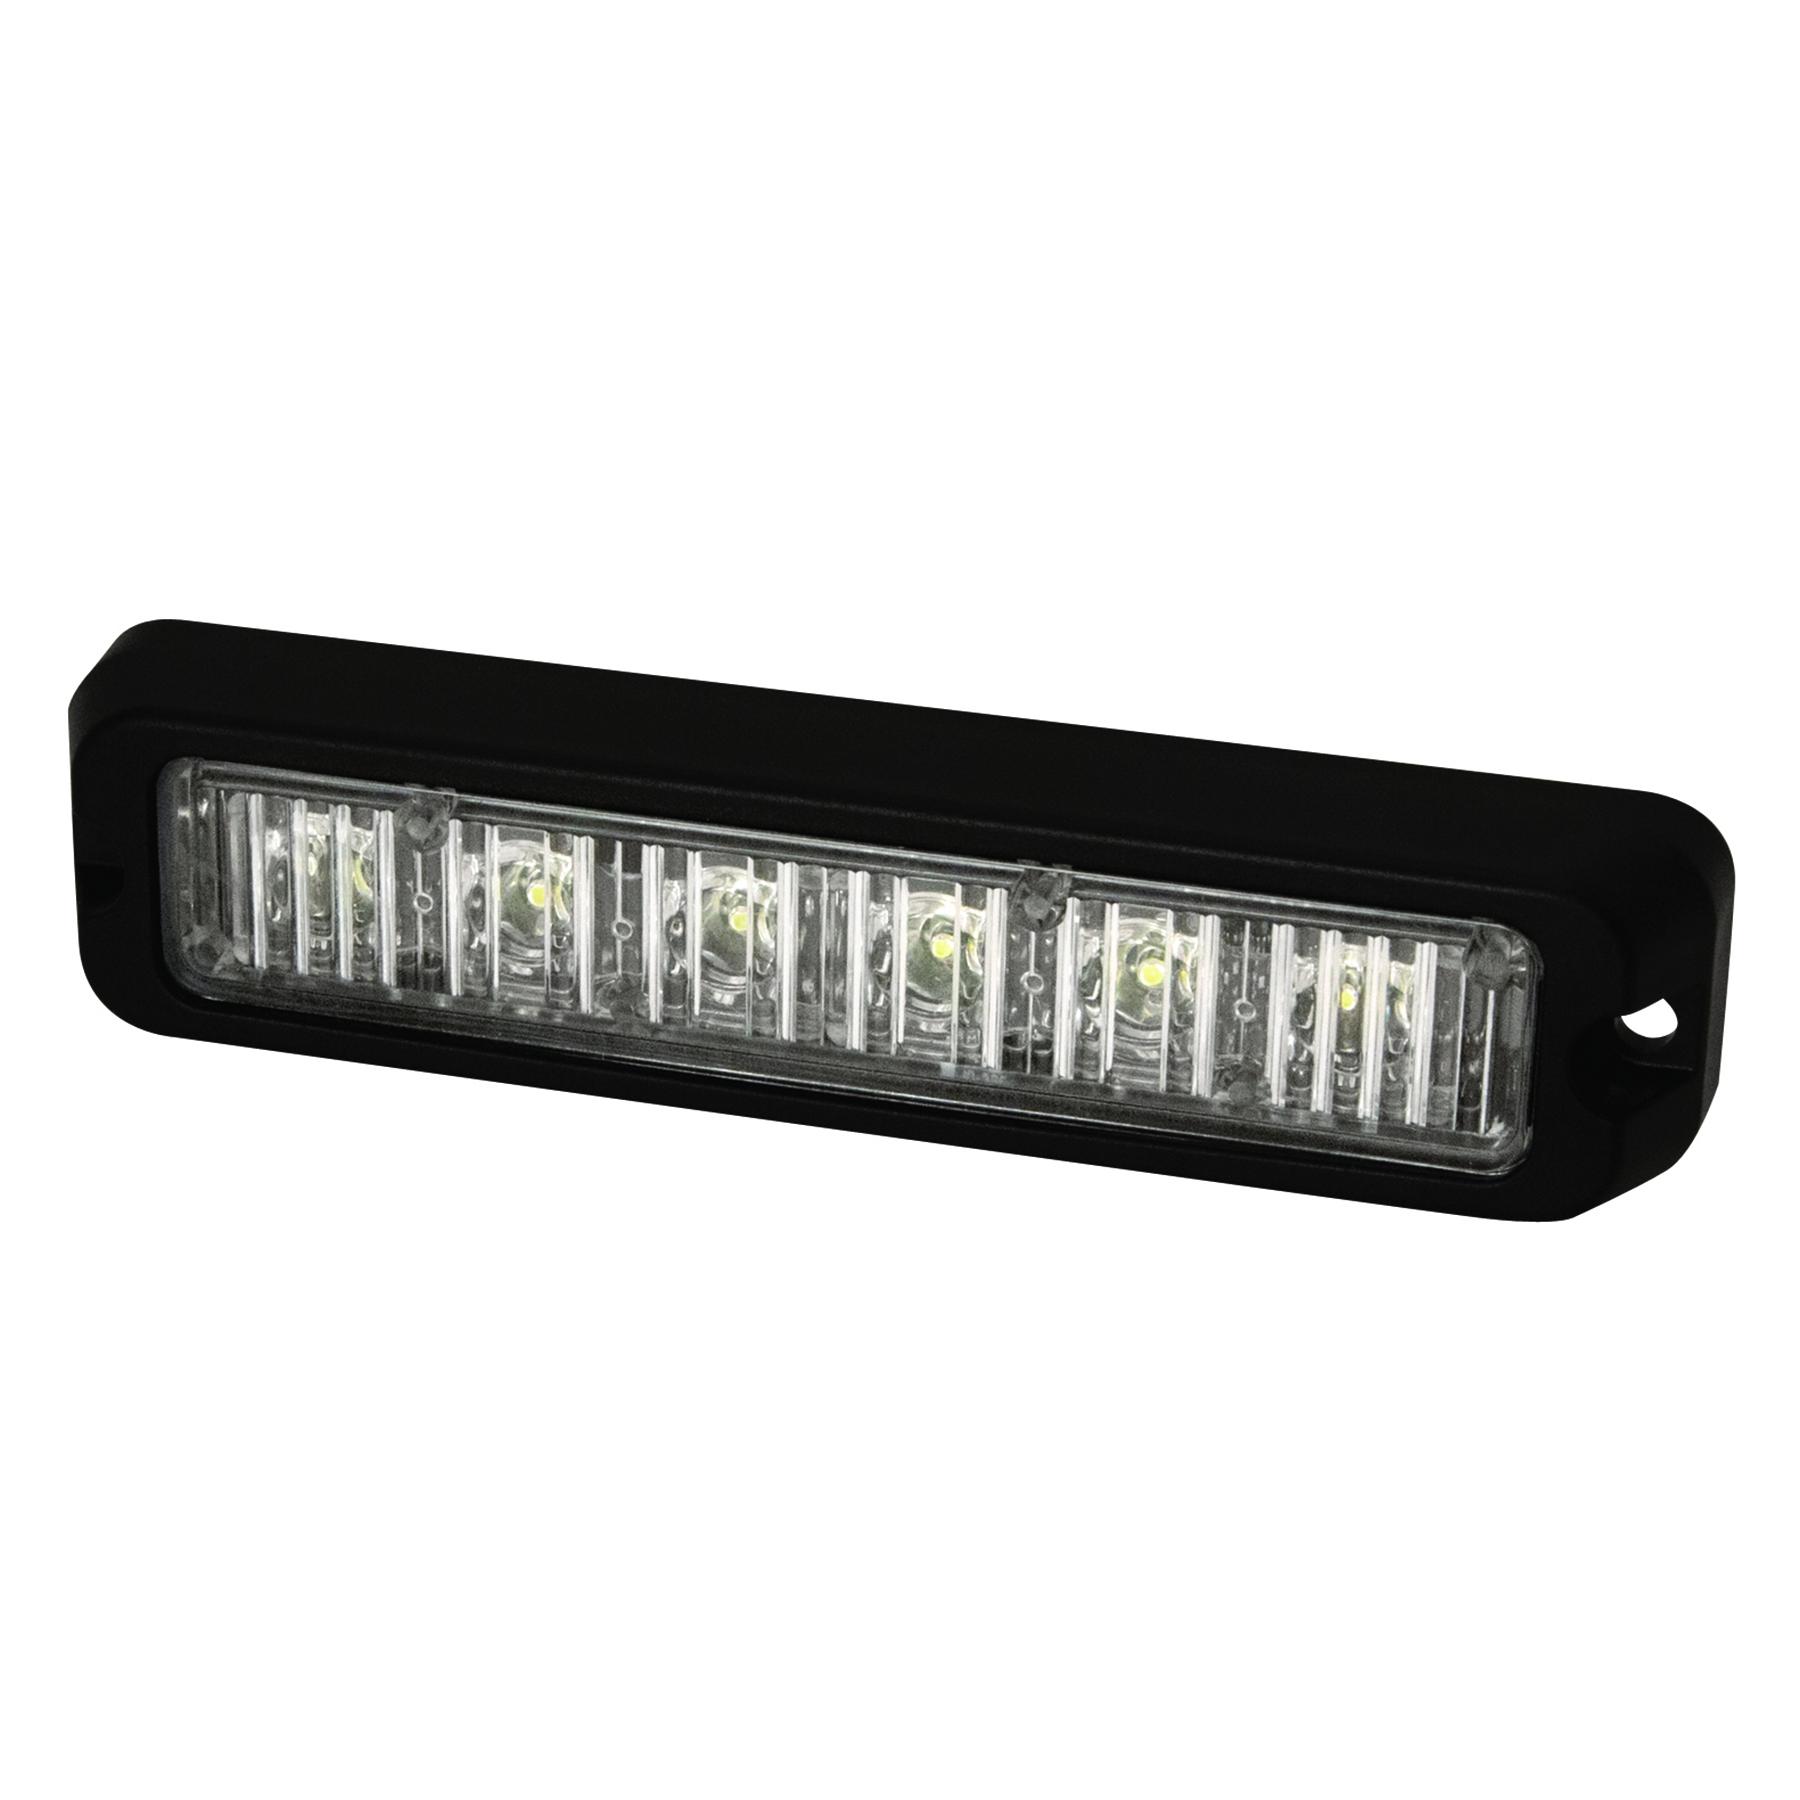 LED Directional Multi Mount - 12/24v - ED3701A